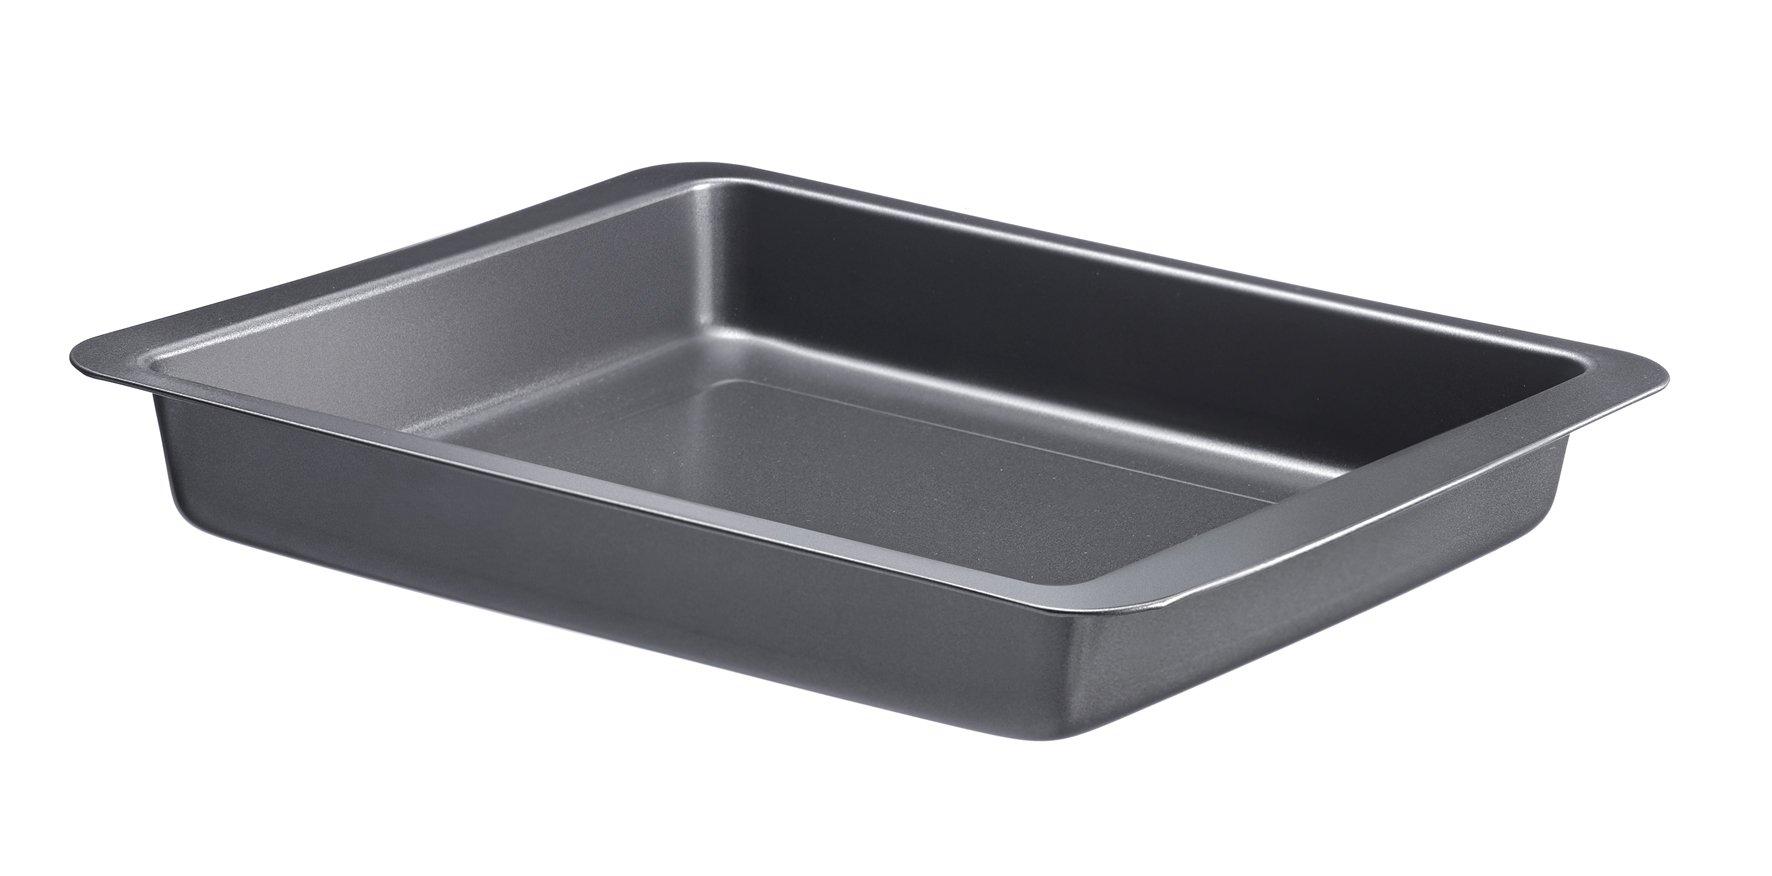 Westmark 32952270 Roasting/Baking Tin, 11'' x 9'' x 4''